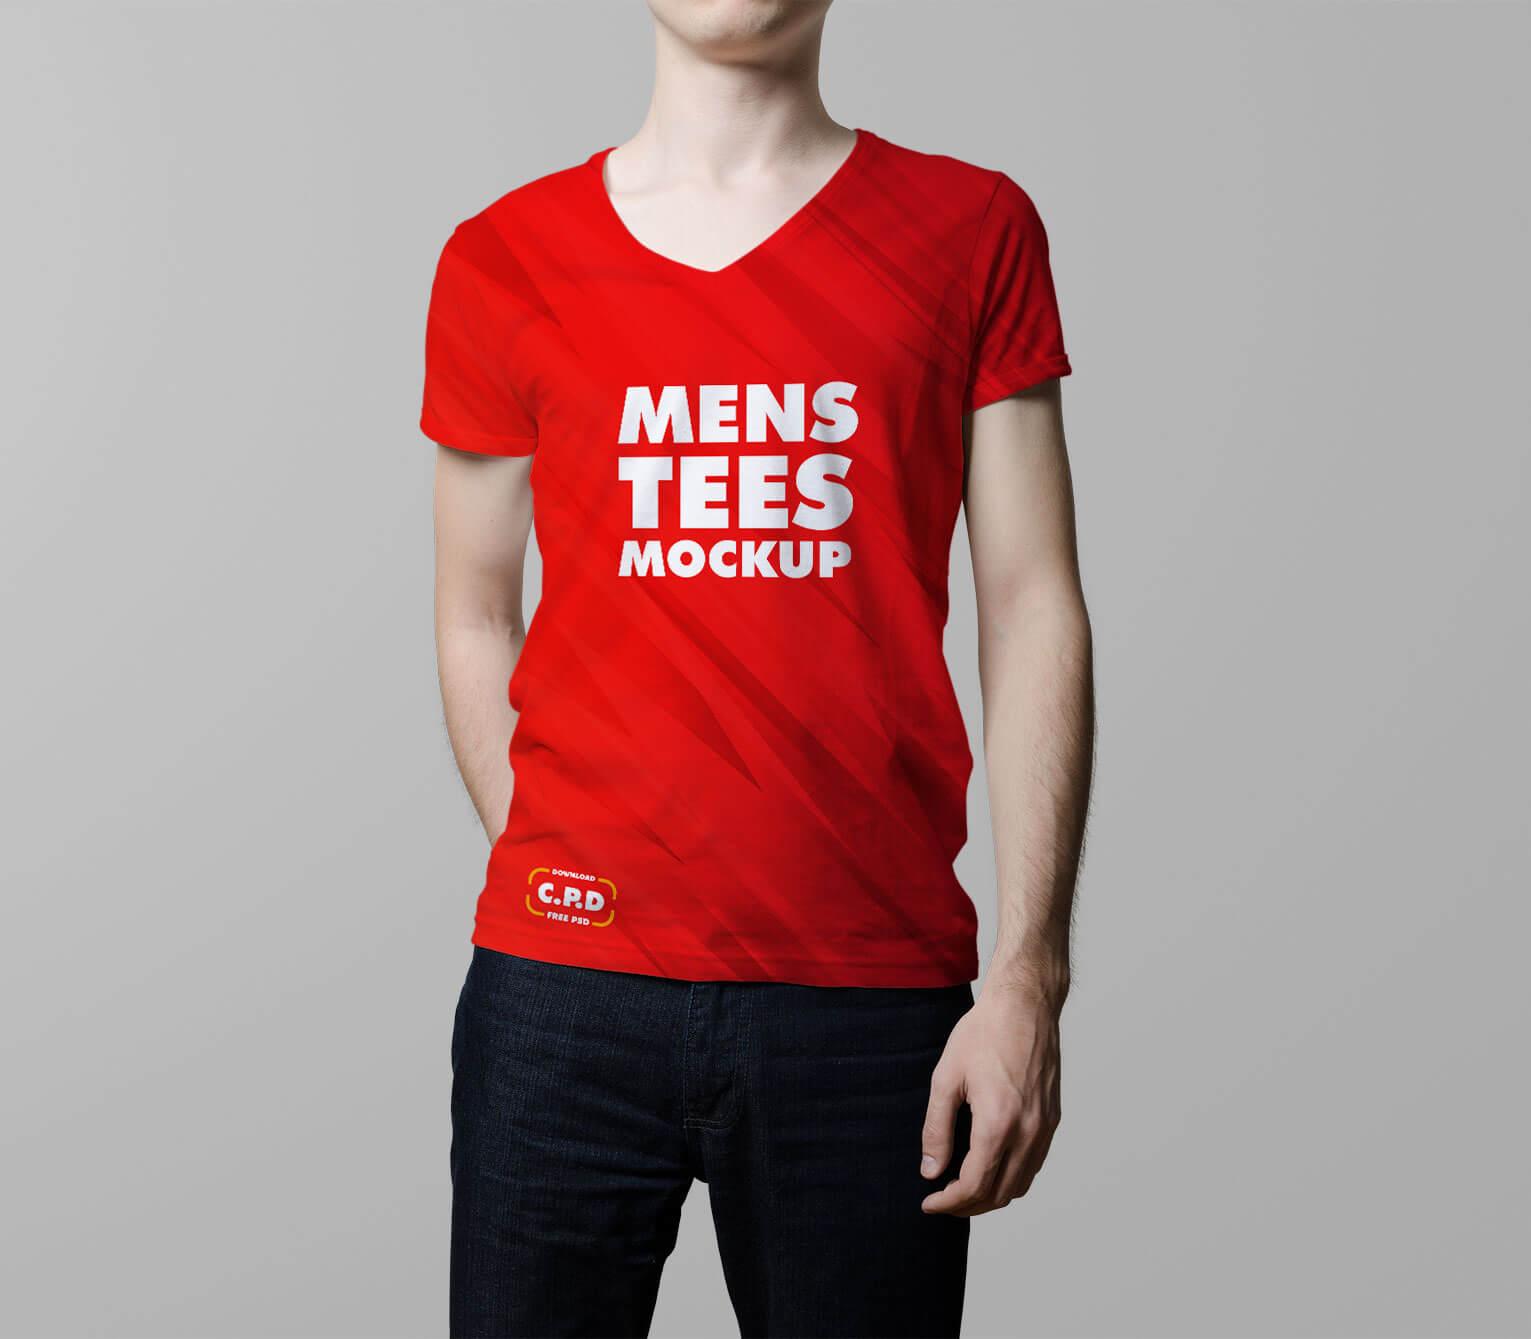 front side t shirt mockup, free tshirt mockup psd, V-Neck Male T-Shirt Mockup Free Psd